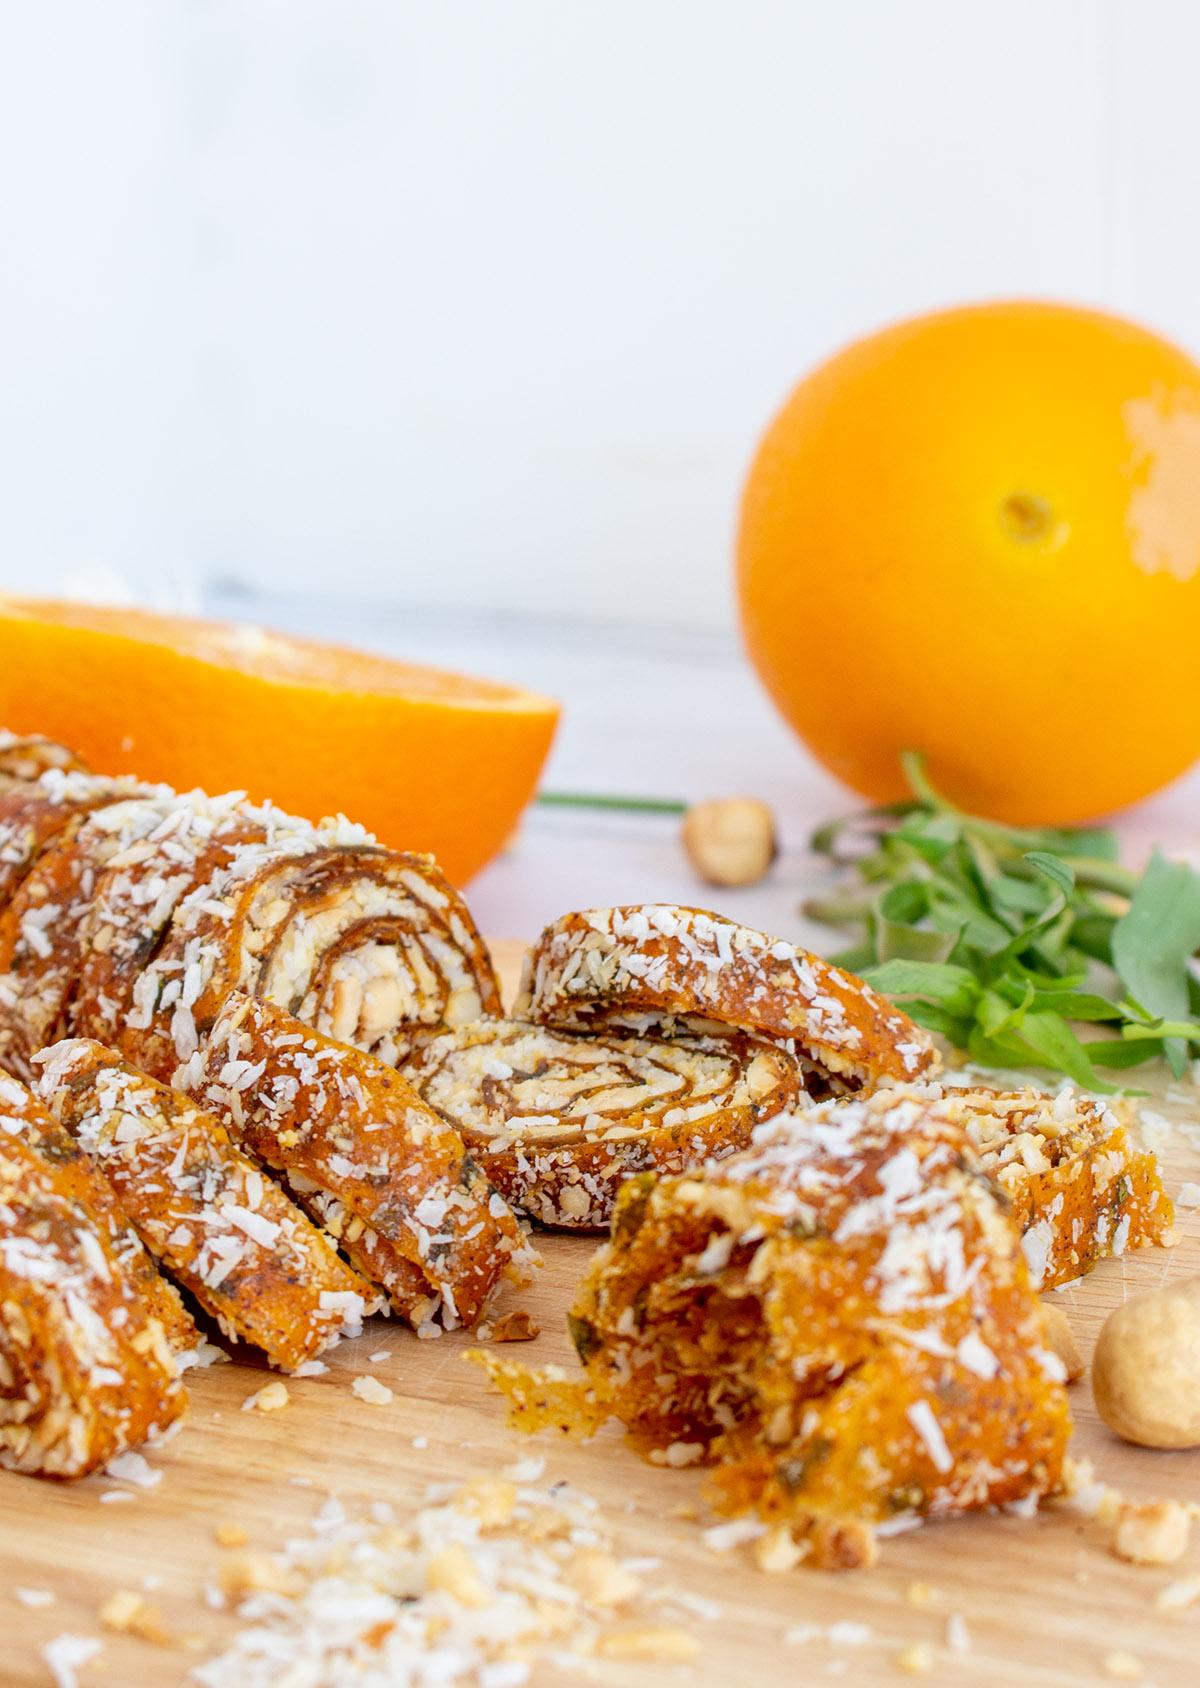 vegan sweets ideas, healthy treats